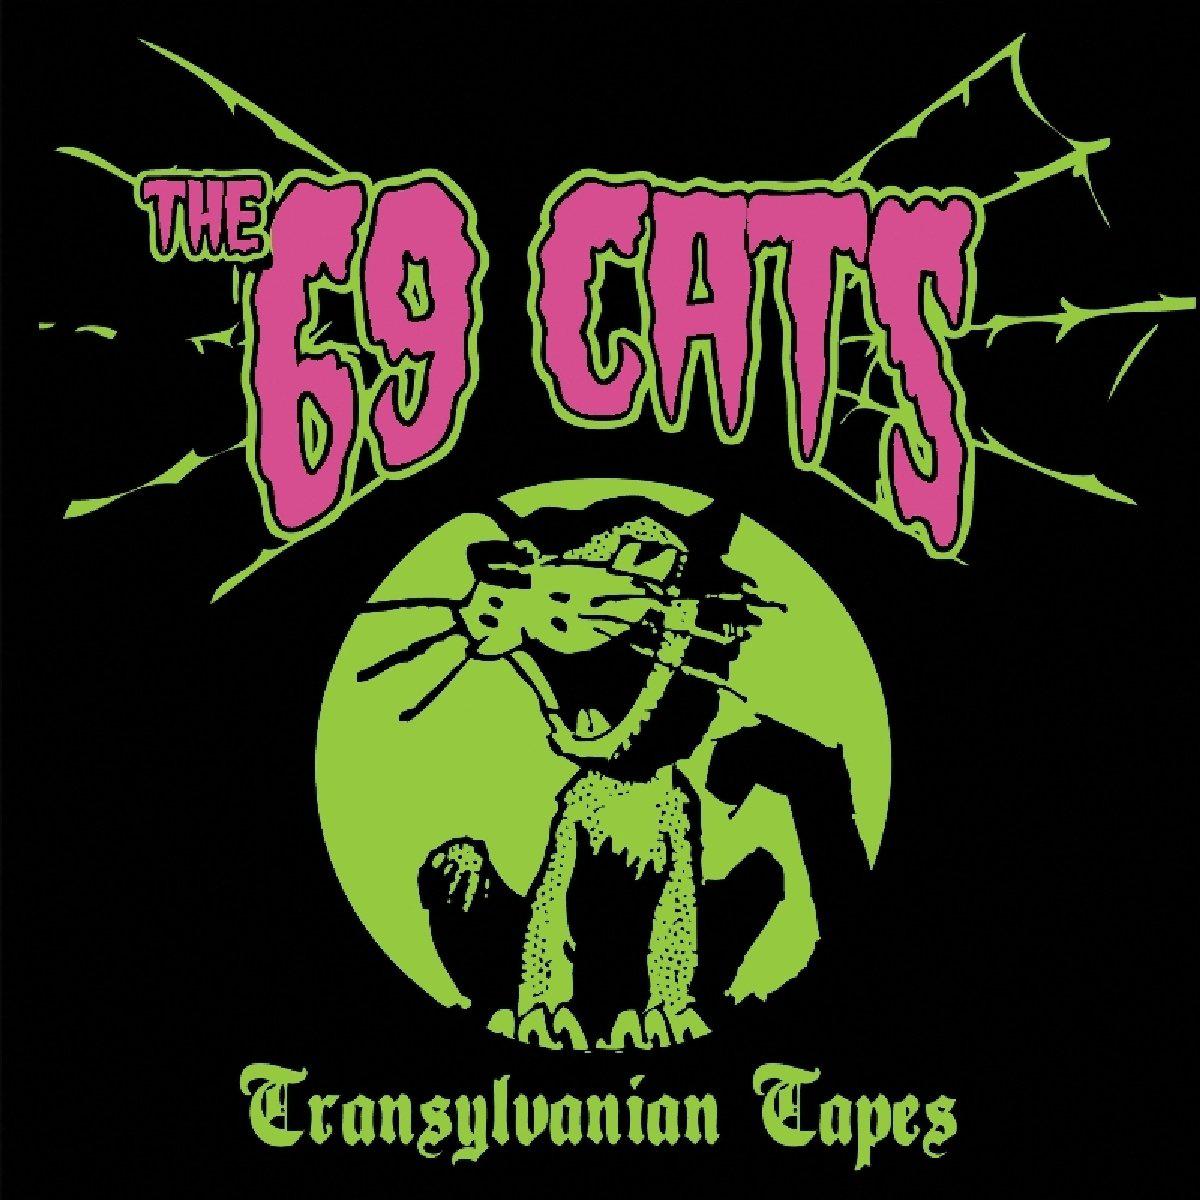 The 69 Cats Cats. Transylvanian Tapes